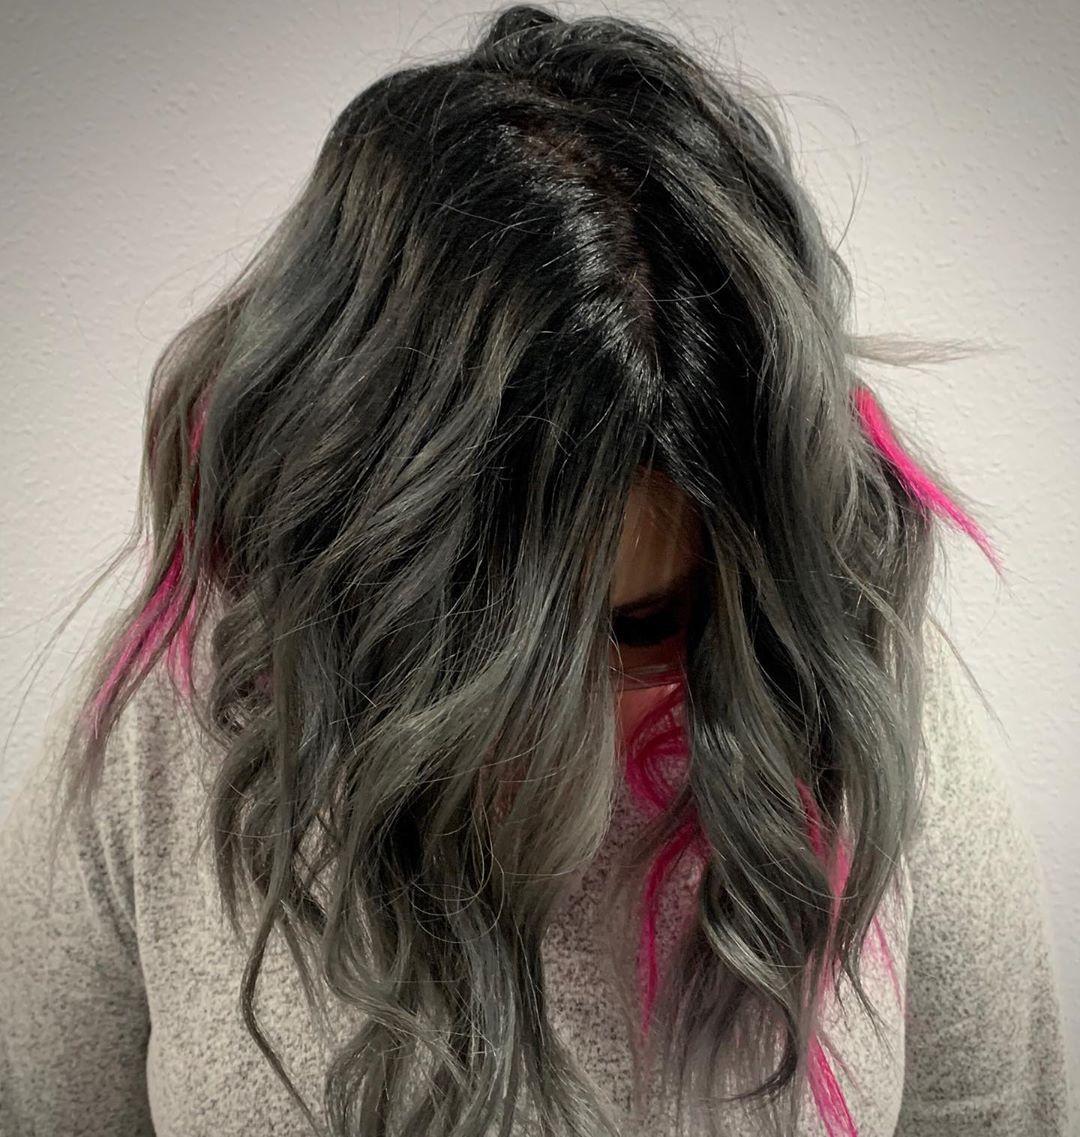 Added some pop of color💗#pinkhair#silverhair#pravanavivids#beauty#hair#greathair#coloredhairgoals#milkshake#trionicshaircare#ombre#rootshadow#goodhair#brattycreations